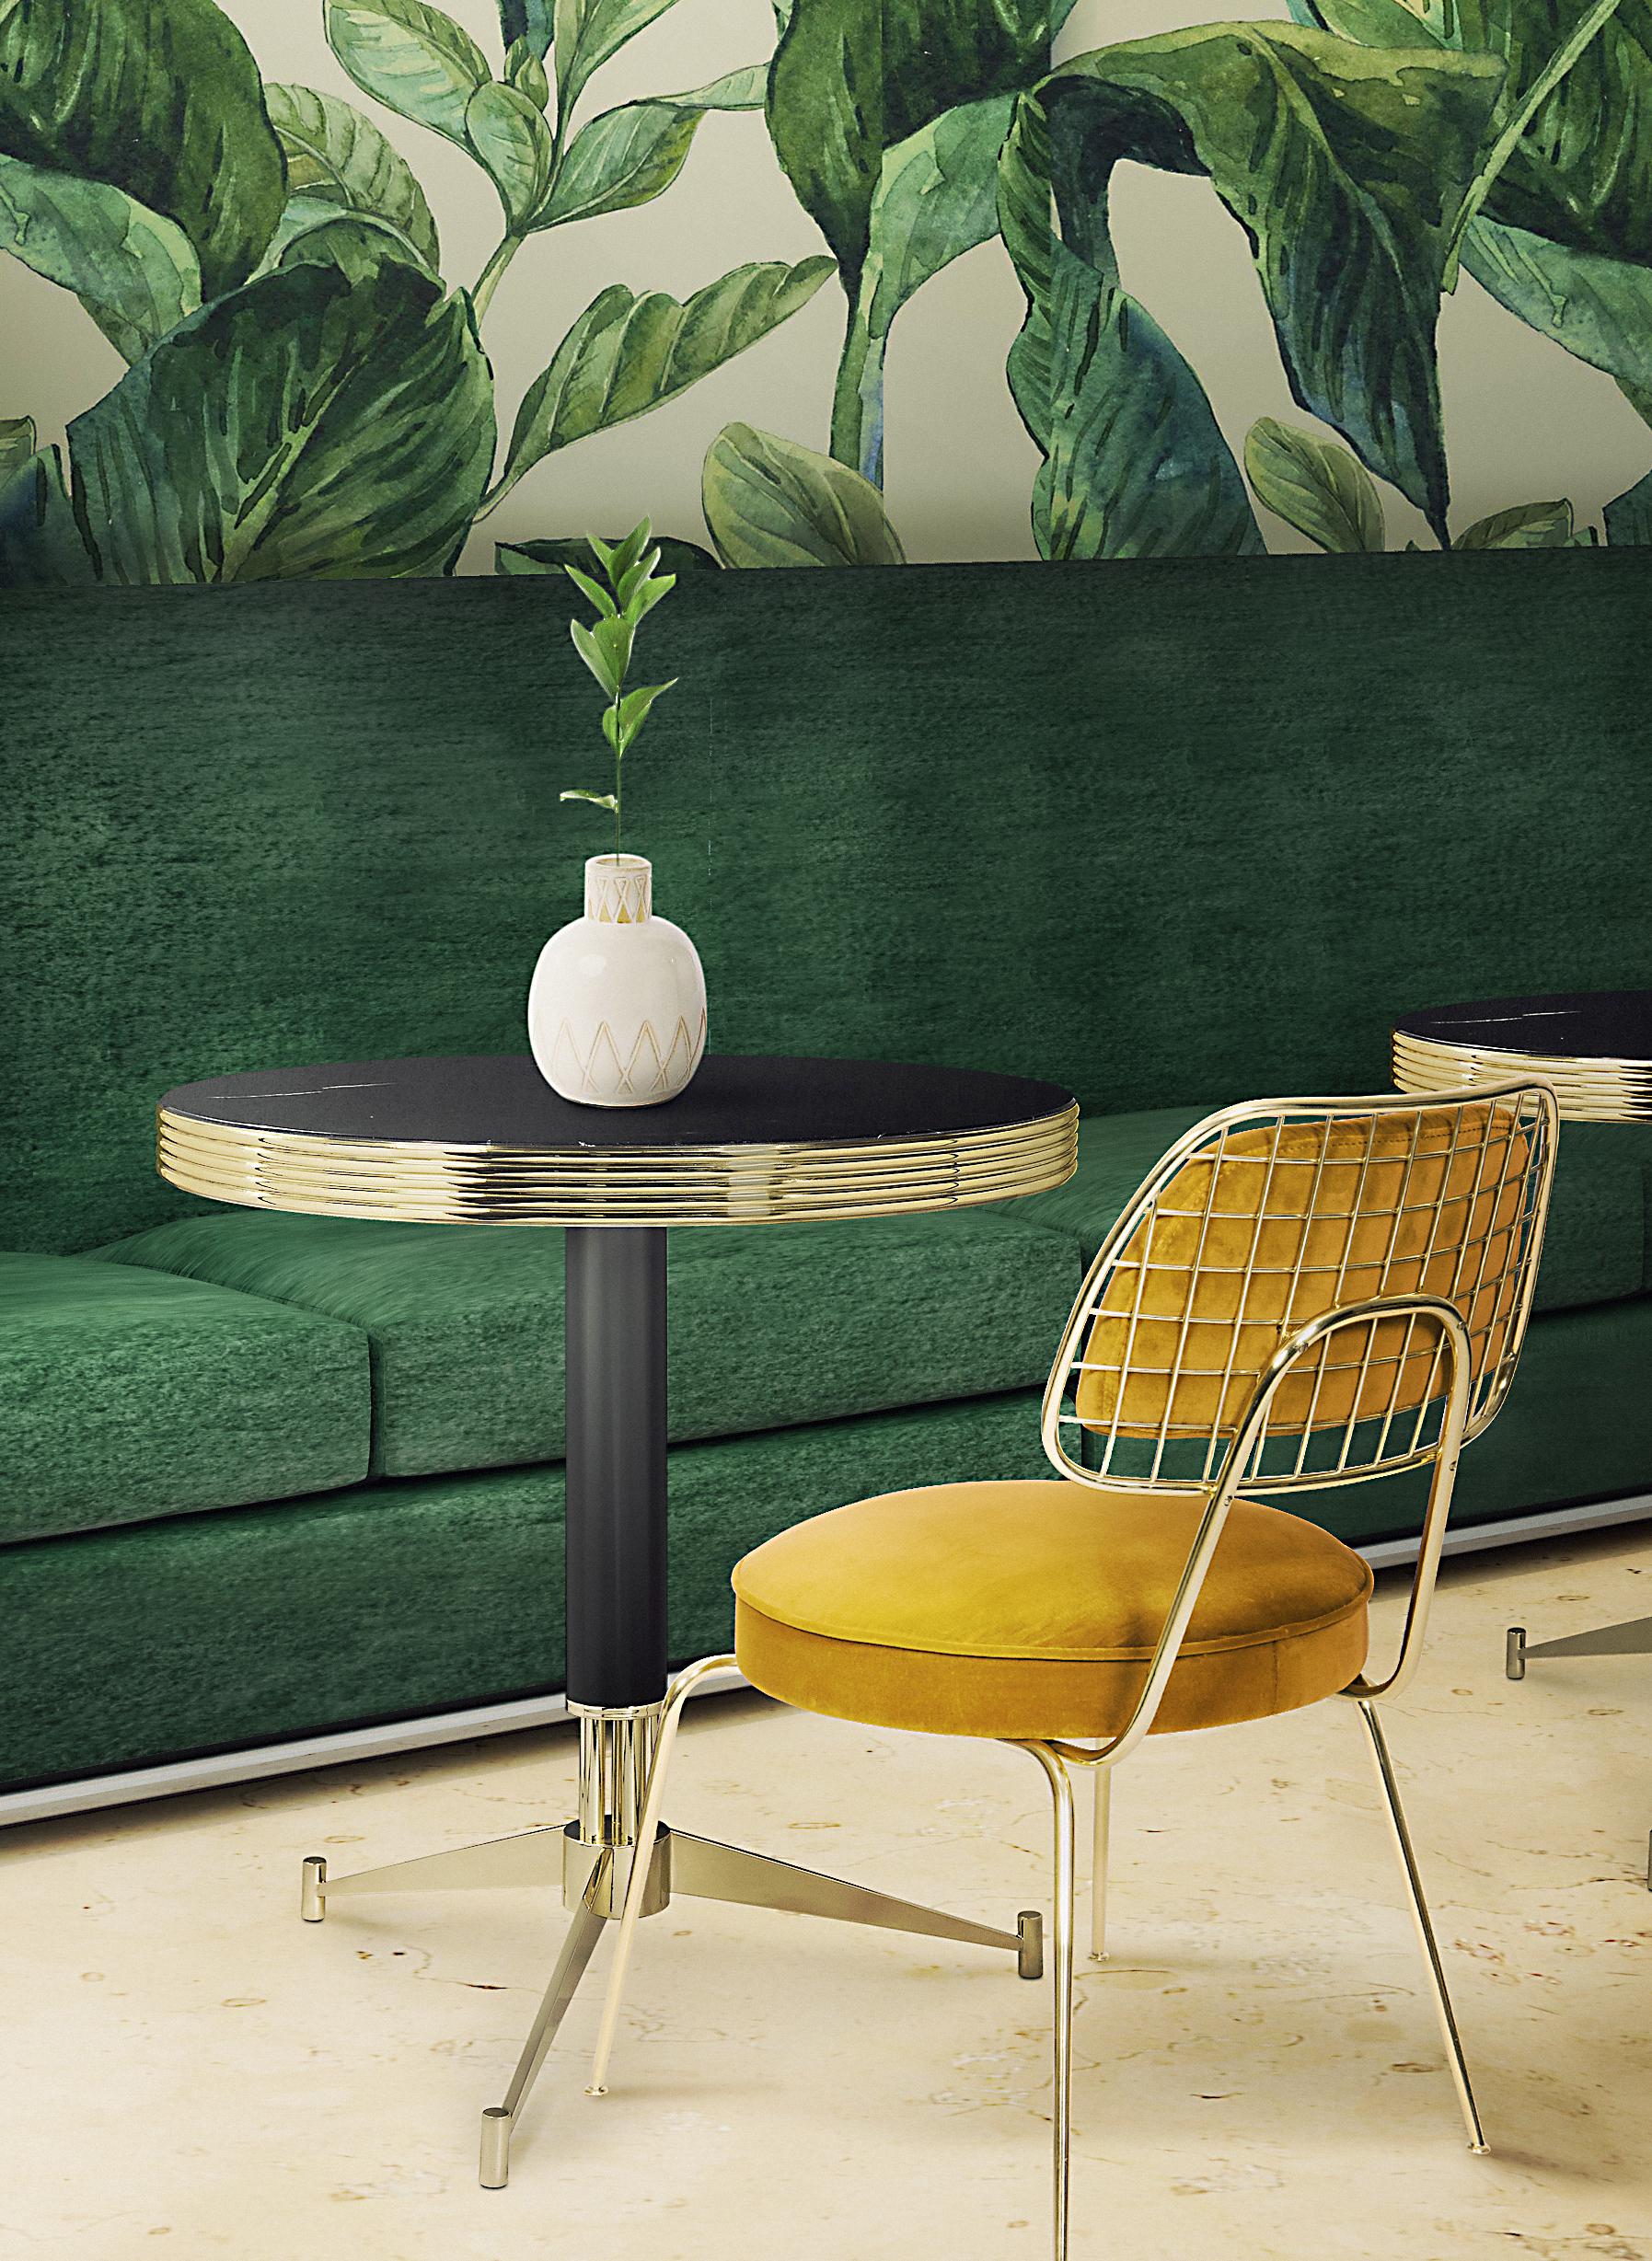 Zo style je de kleur groen in je interieur - INTERIOR JUNKIE